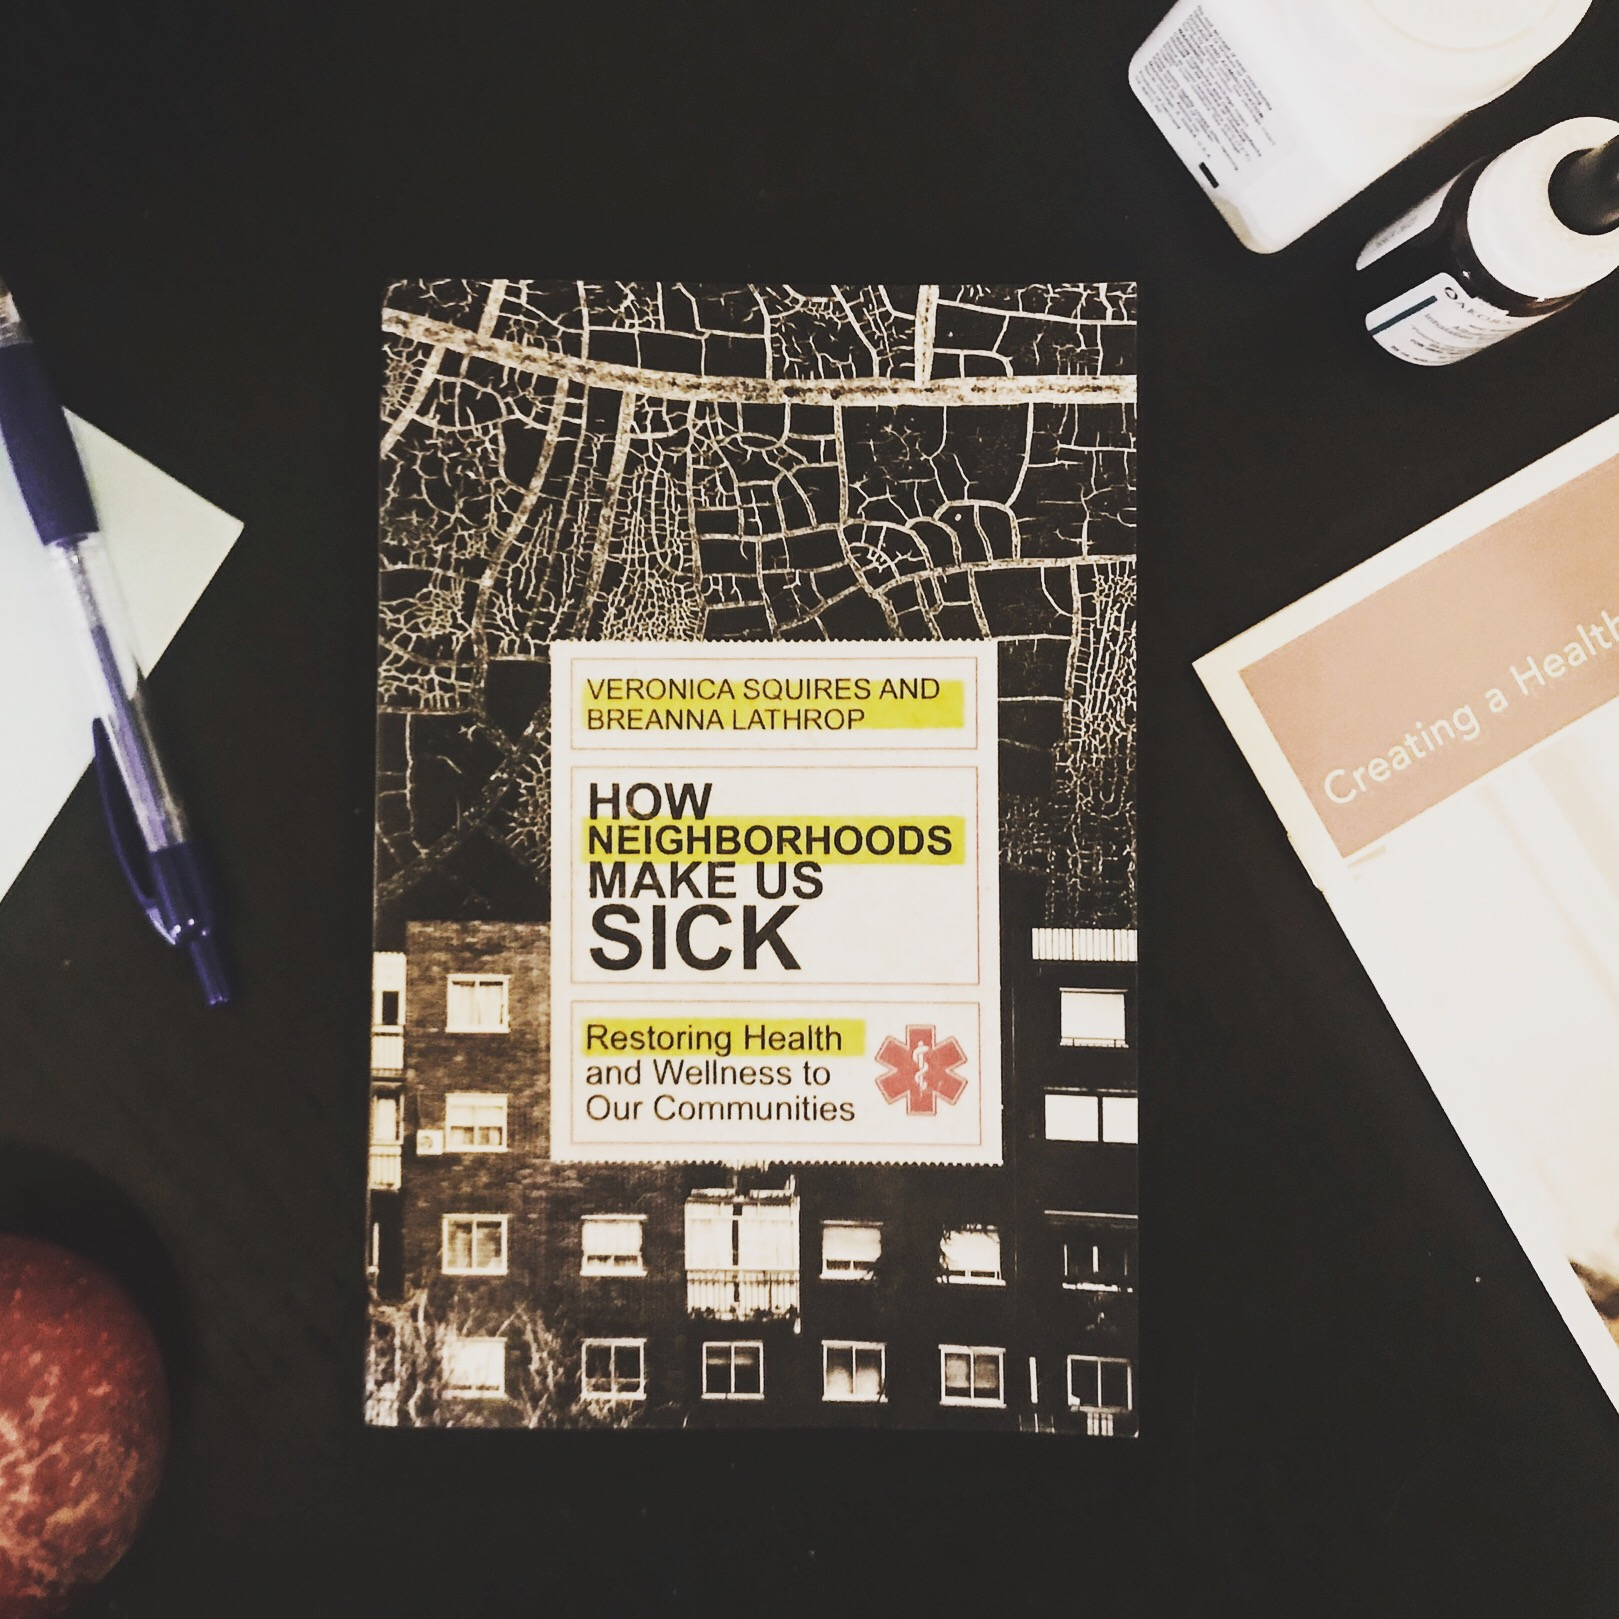 21 How Neighborhoods Make Us Sick.JPG